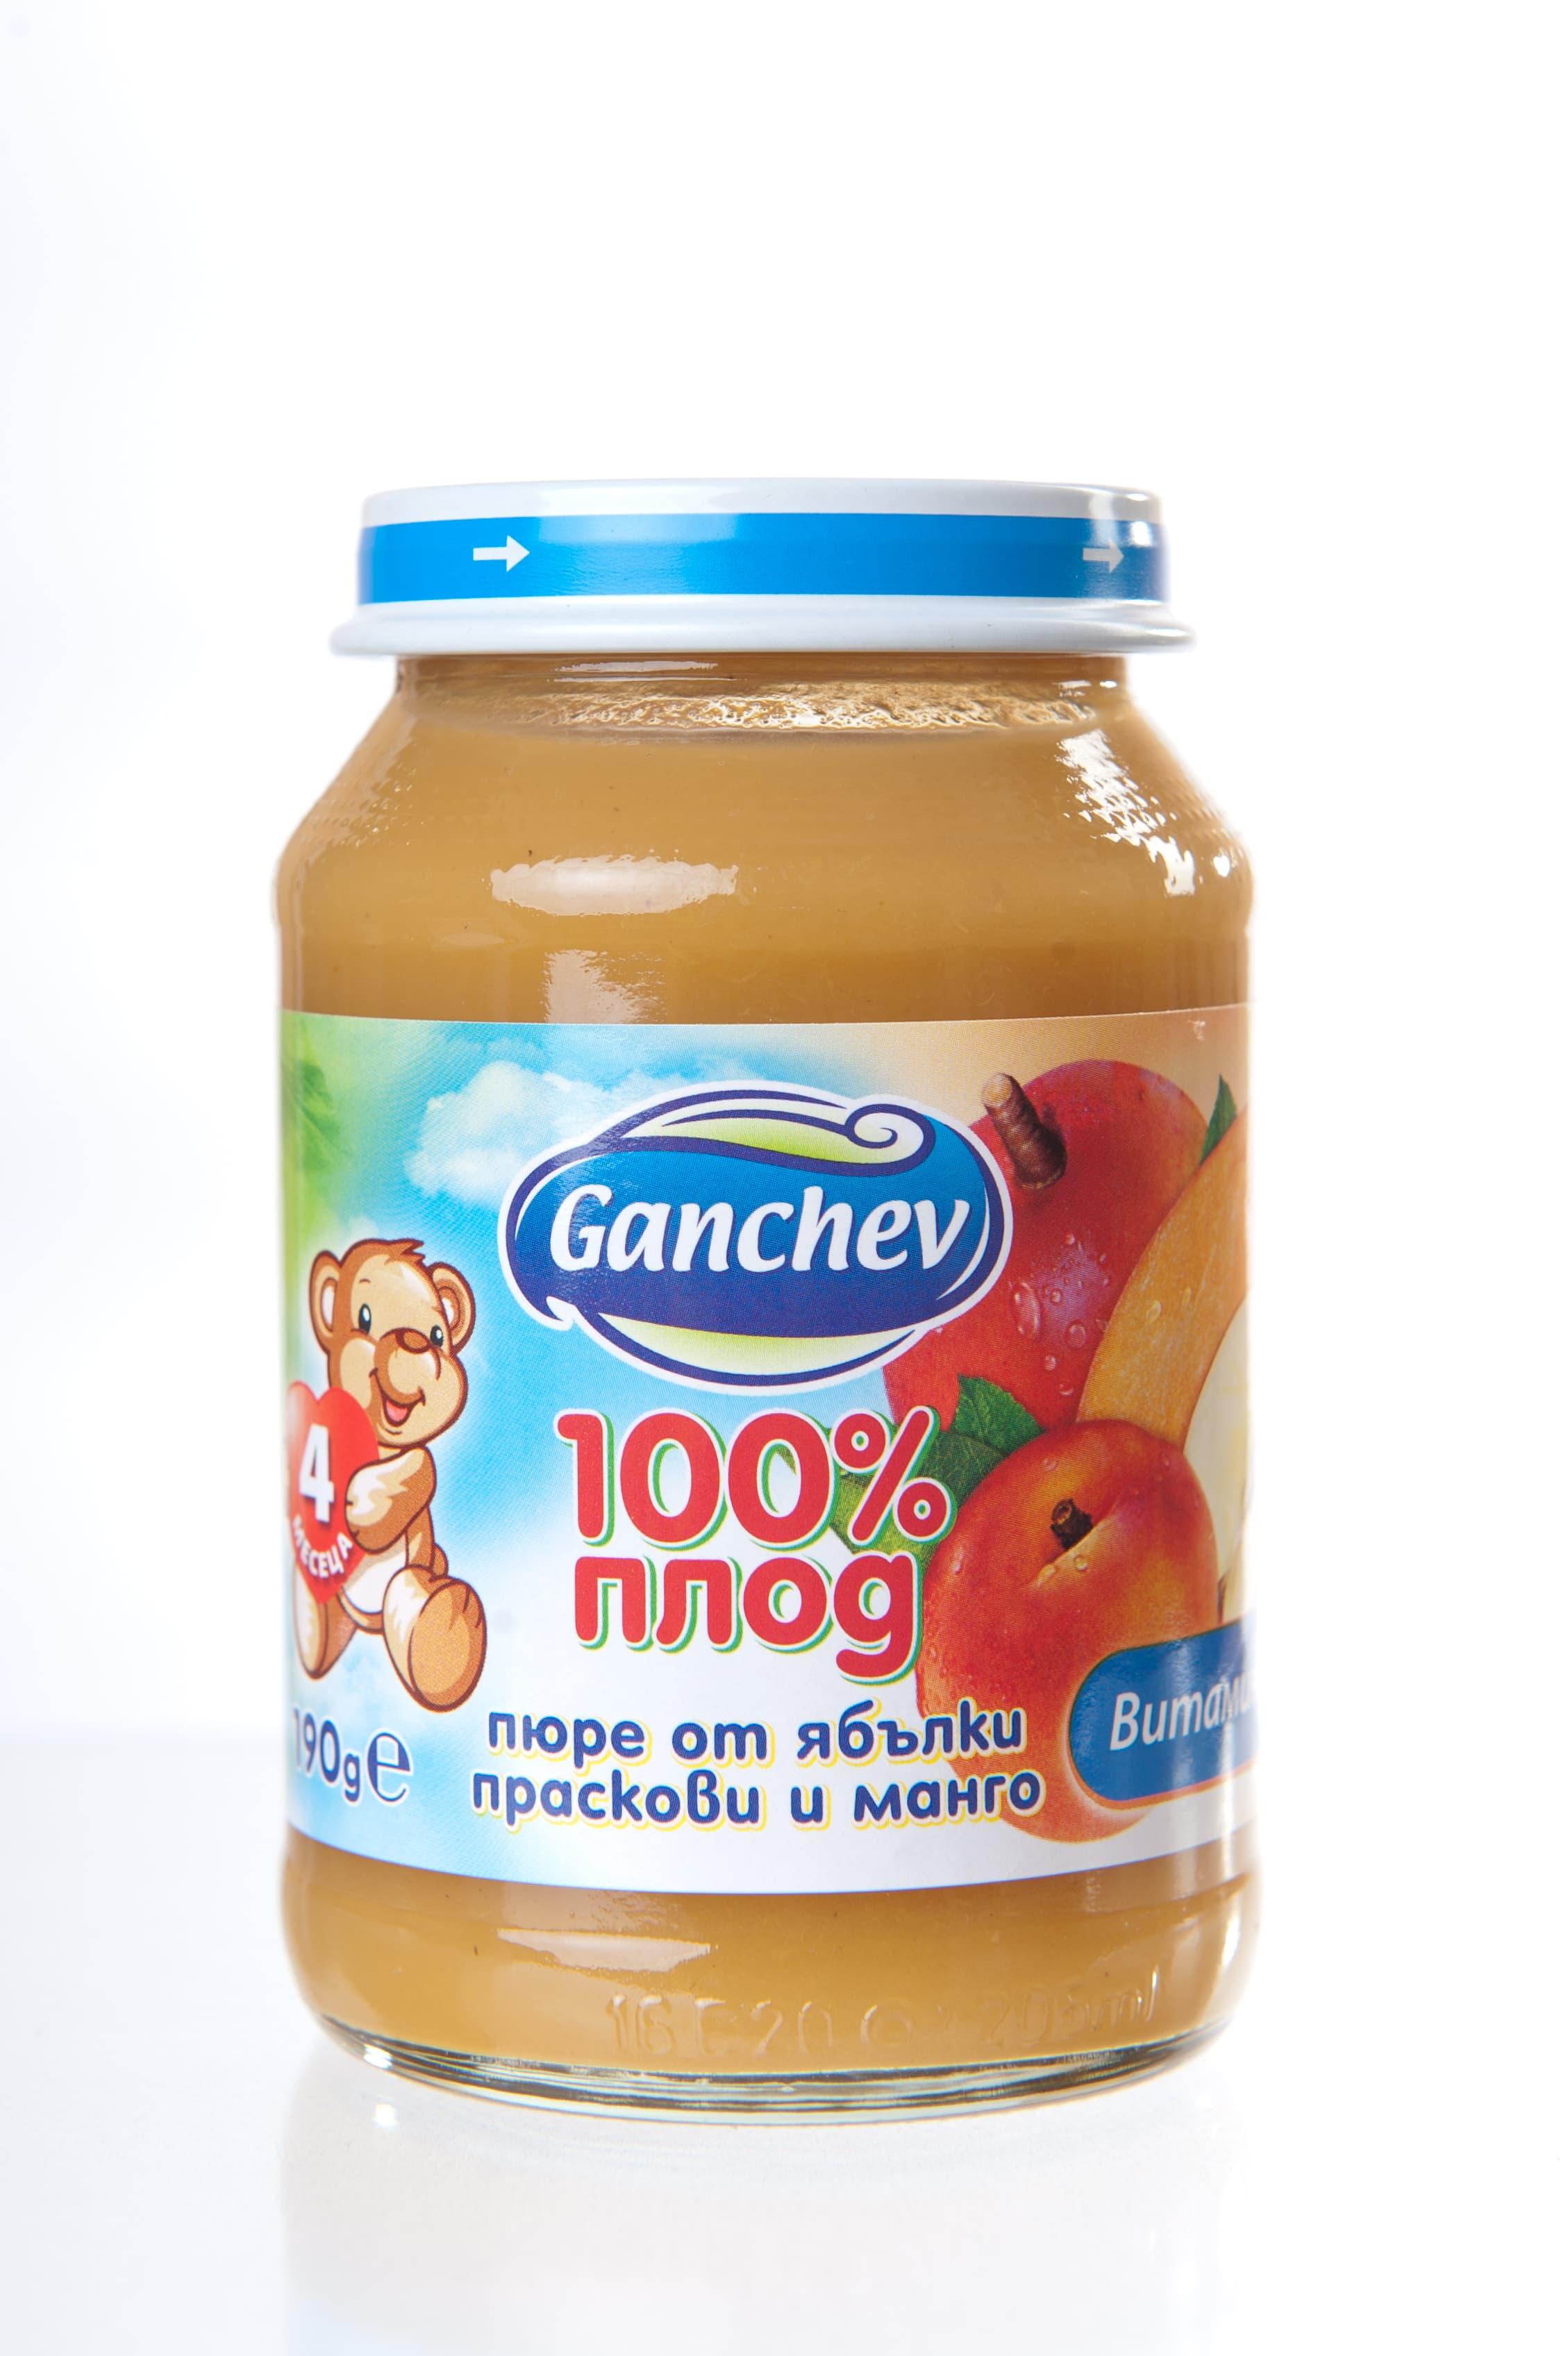 Ganchev-пюре ябълка праскови и манго 4м+ 190гр